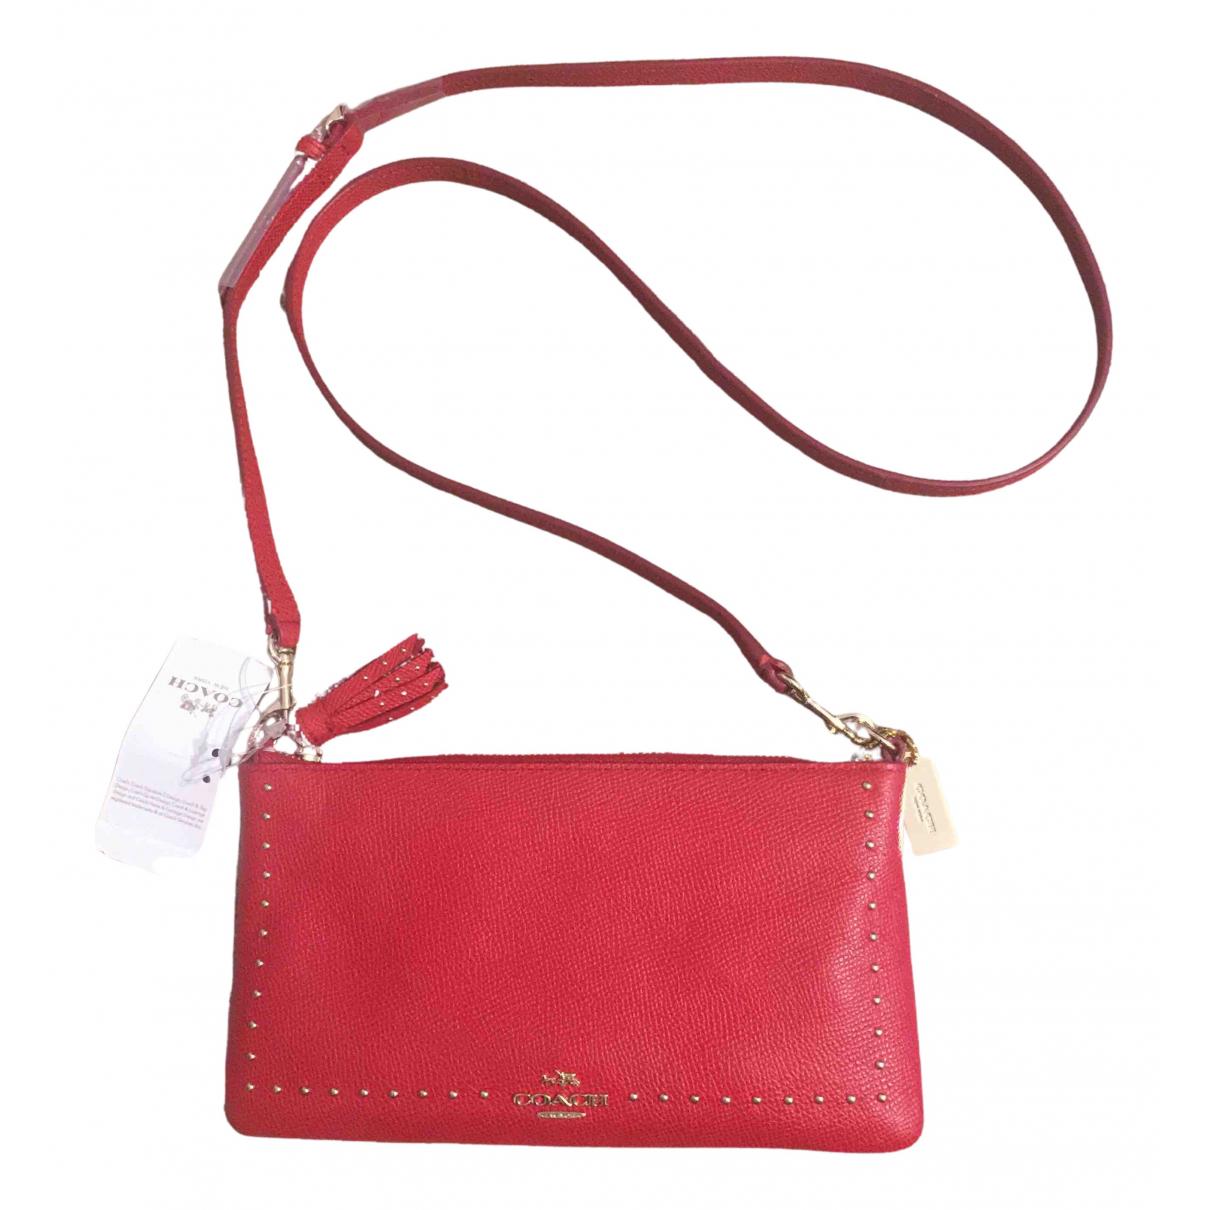 Coach N Red Leather handbag for Women N